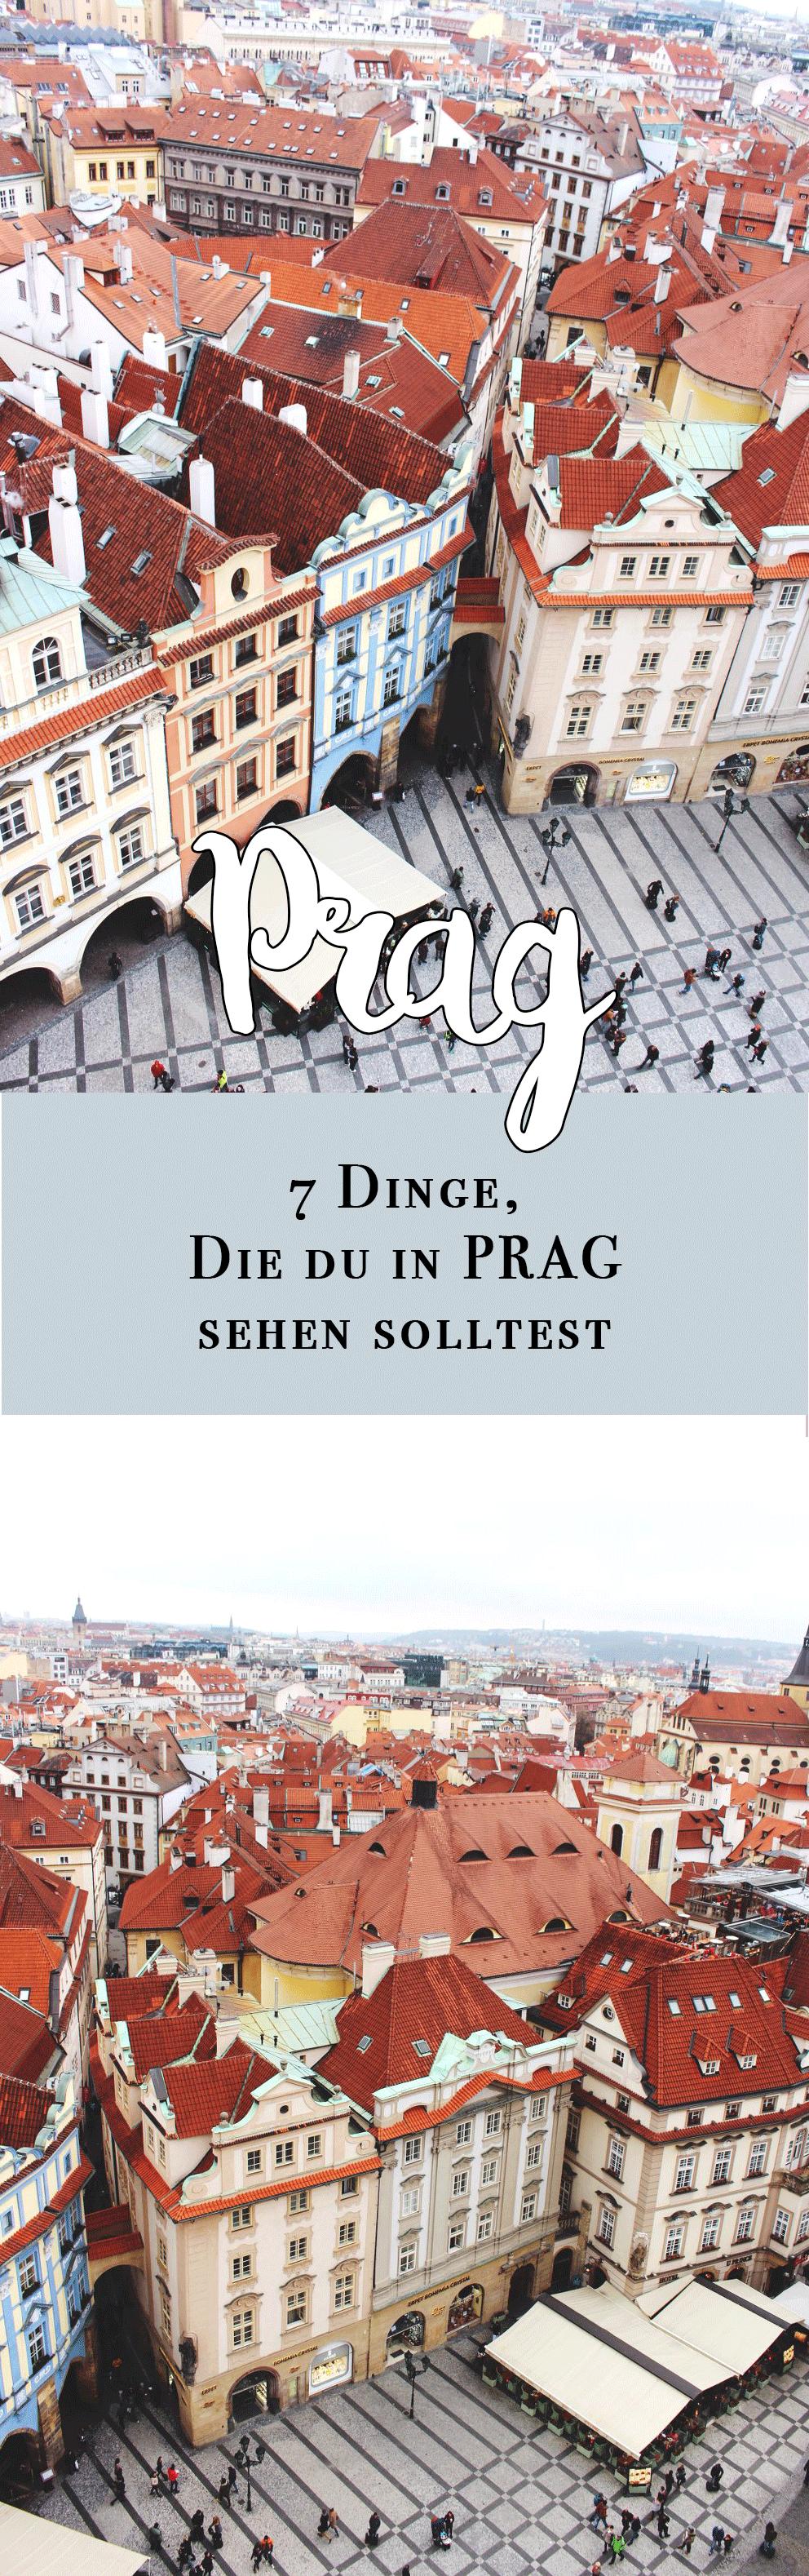 prag-sehenswürdigkeiten in präg-dinge die du in Prag sehen solltest